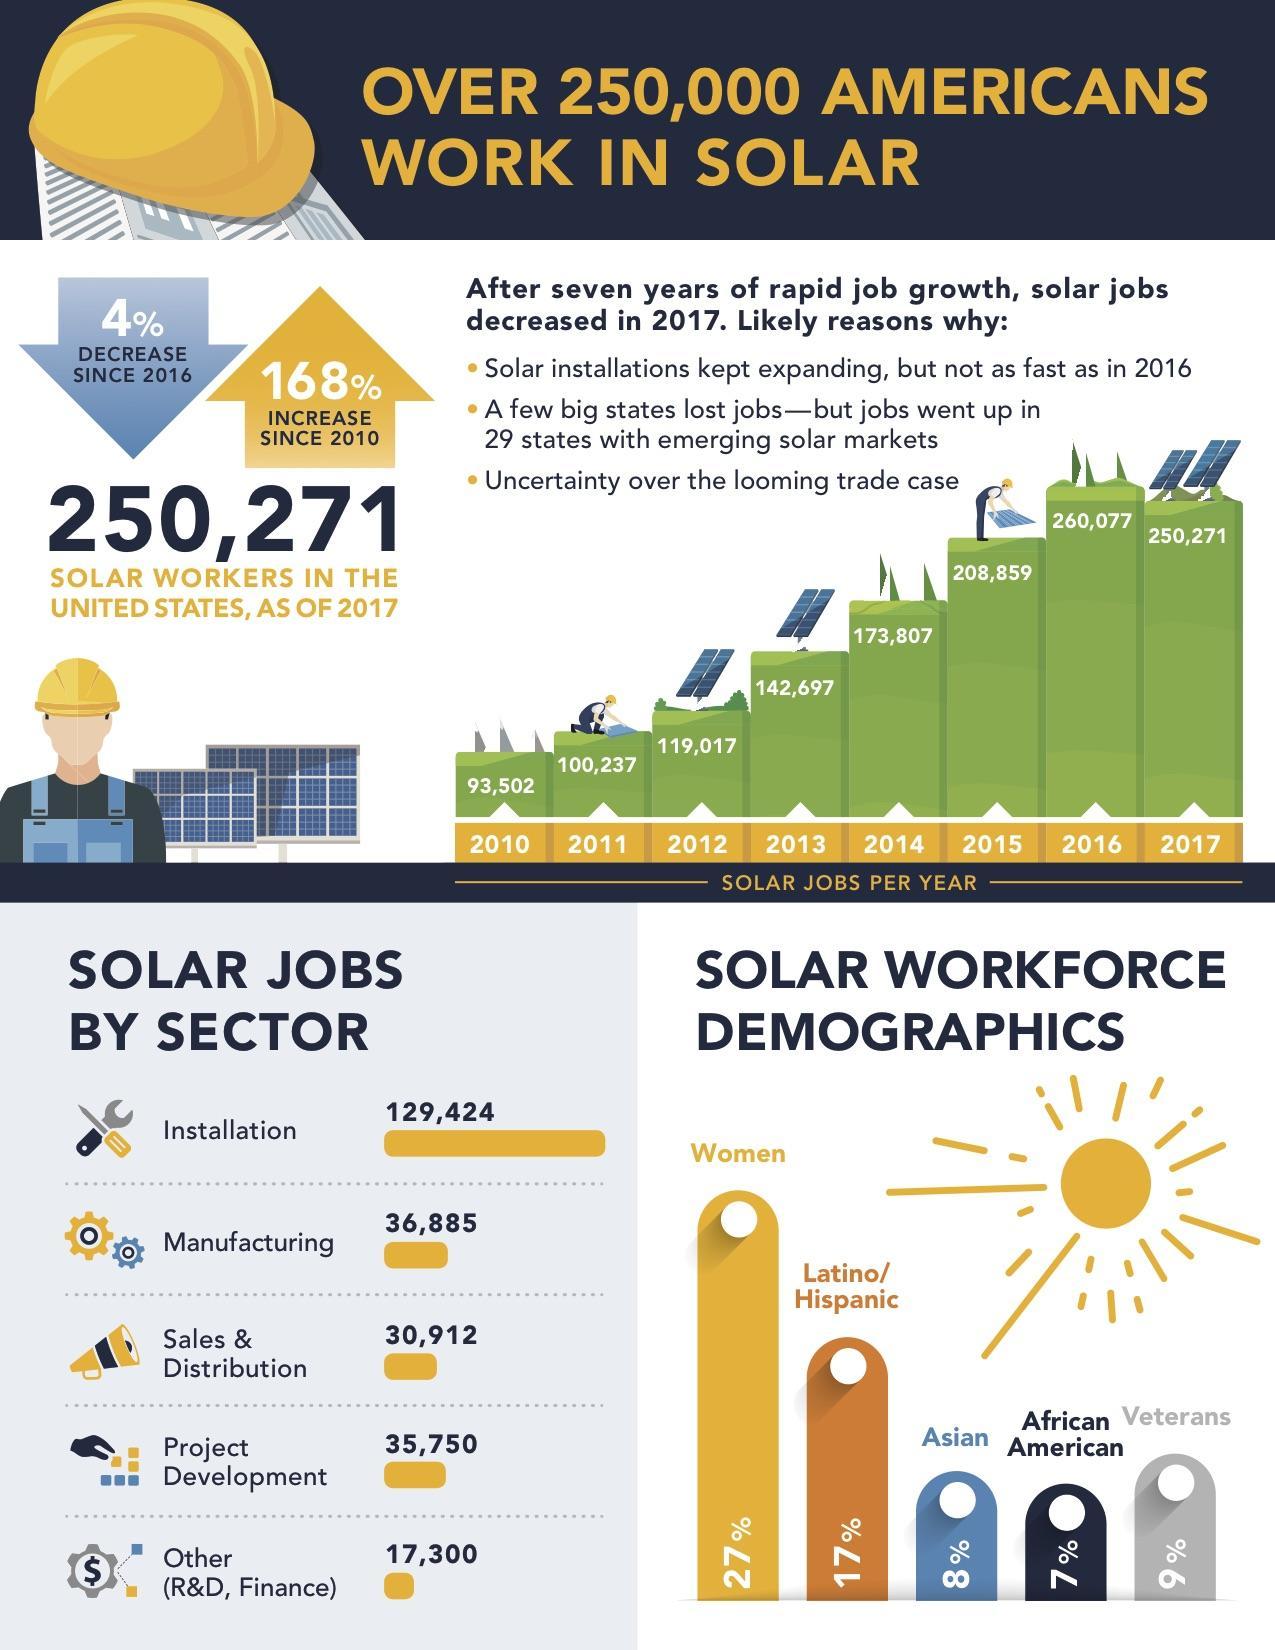 Solar Jobs Down in California, Nevada   KUNR